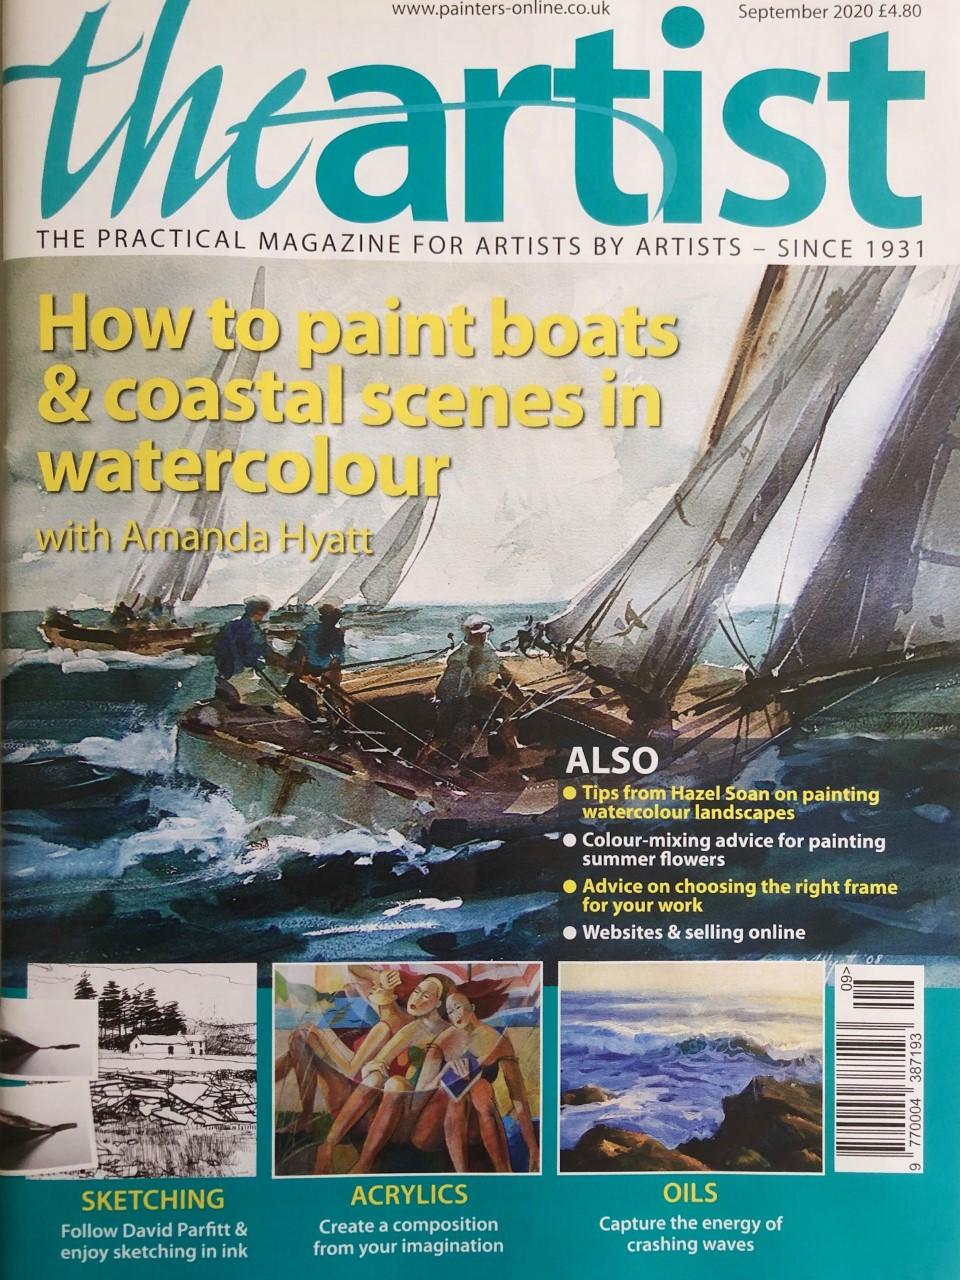 The Artist magazine